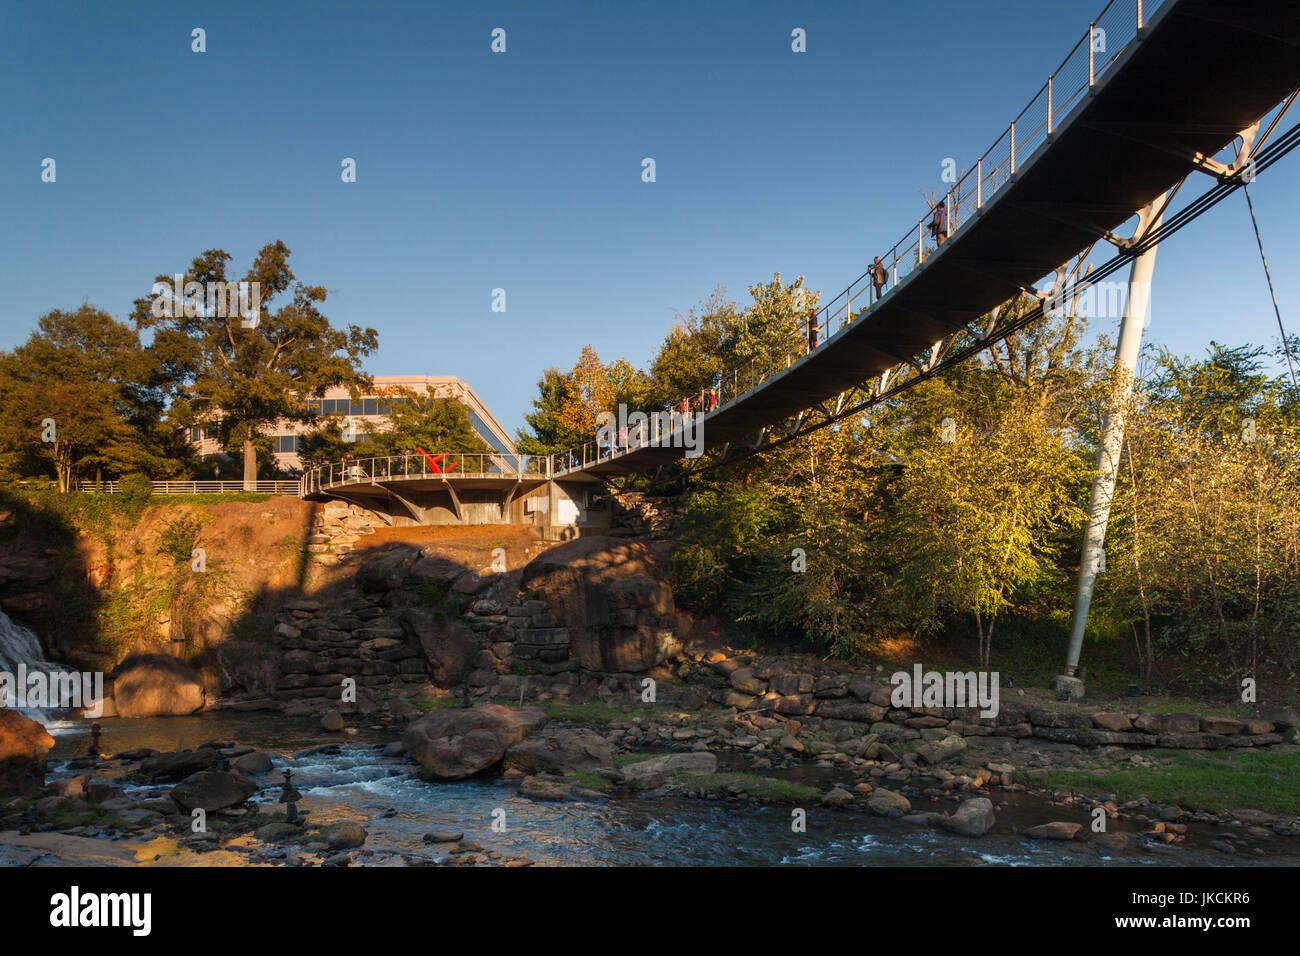 USA, Greenville, South Carolina, Falls Park am Reedy River, Freiheitsbrücke, Miqel Rosales, Architekt Stockbild